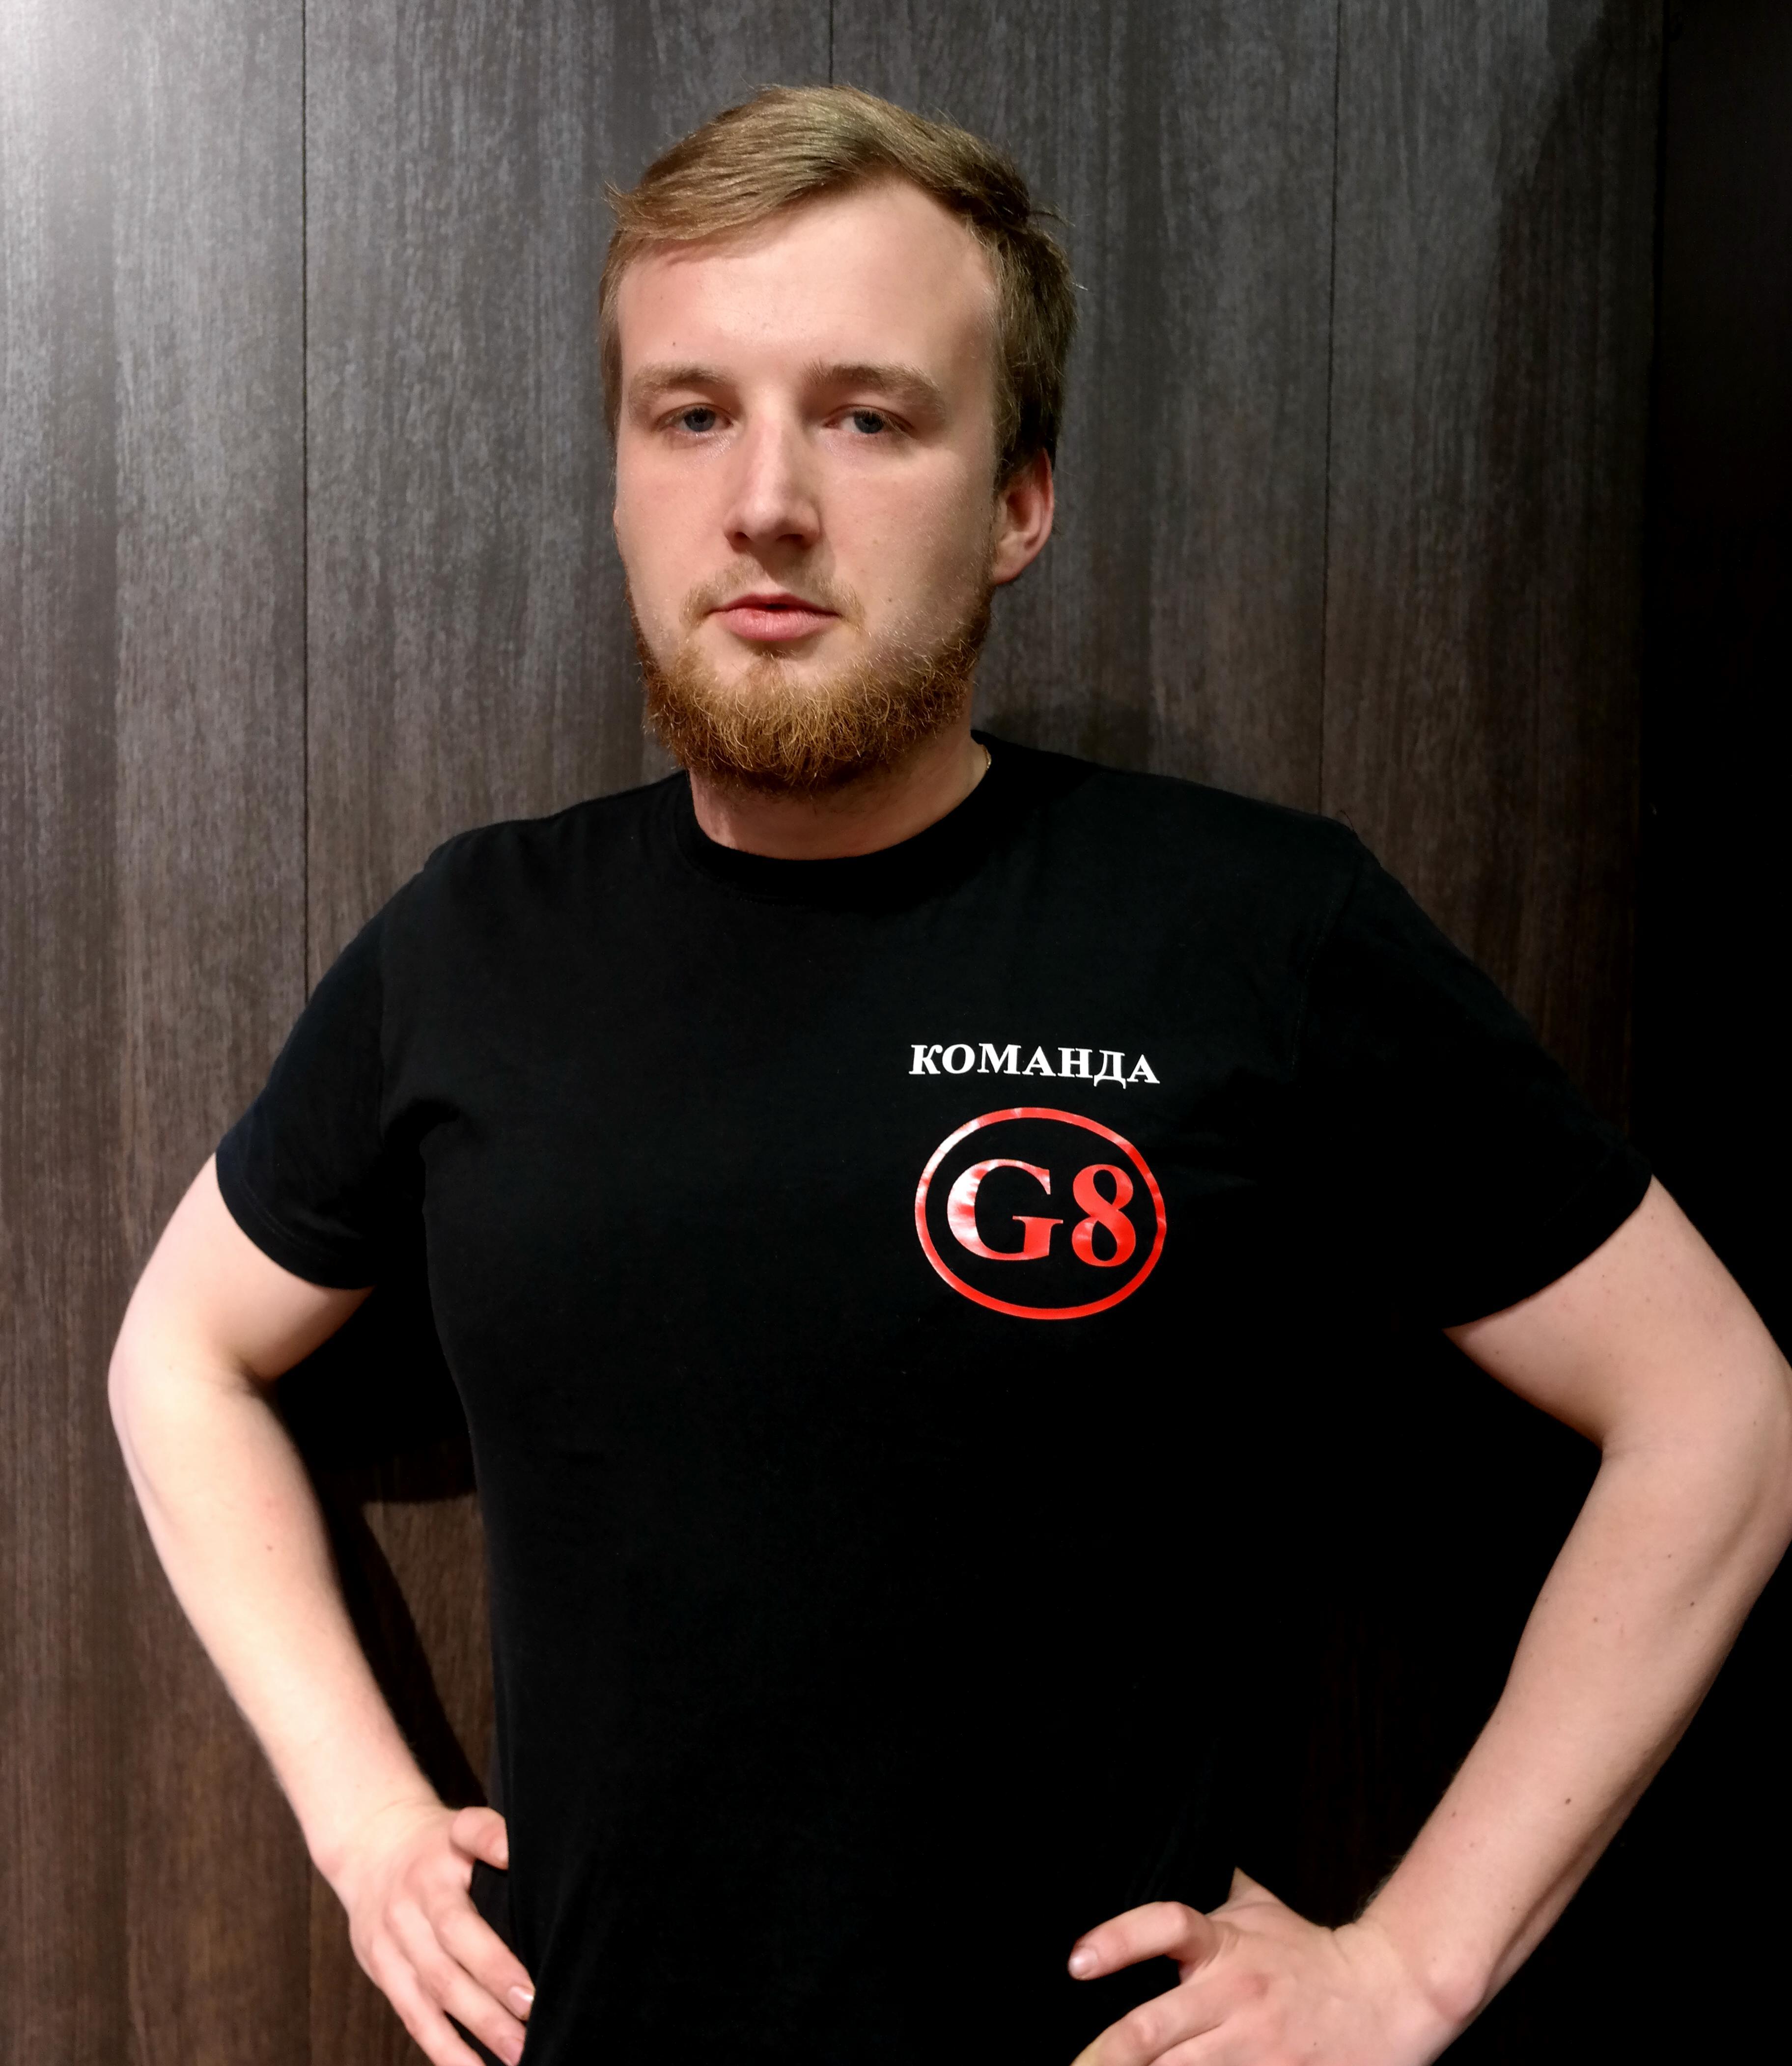 Команда G8: ПАВЕЛ КУЧЕРЯВЫЙ